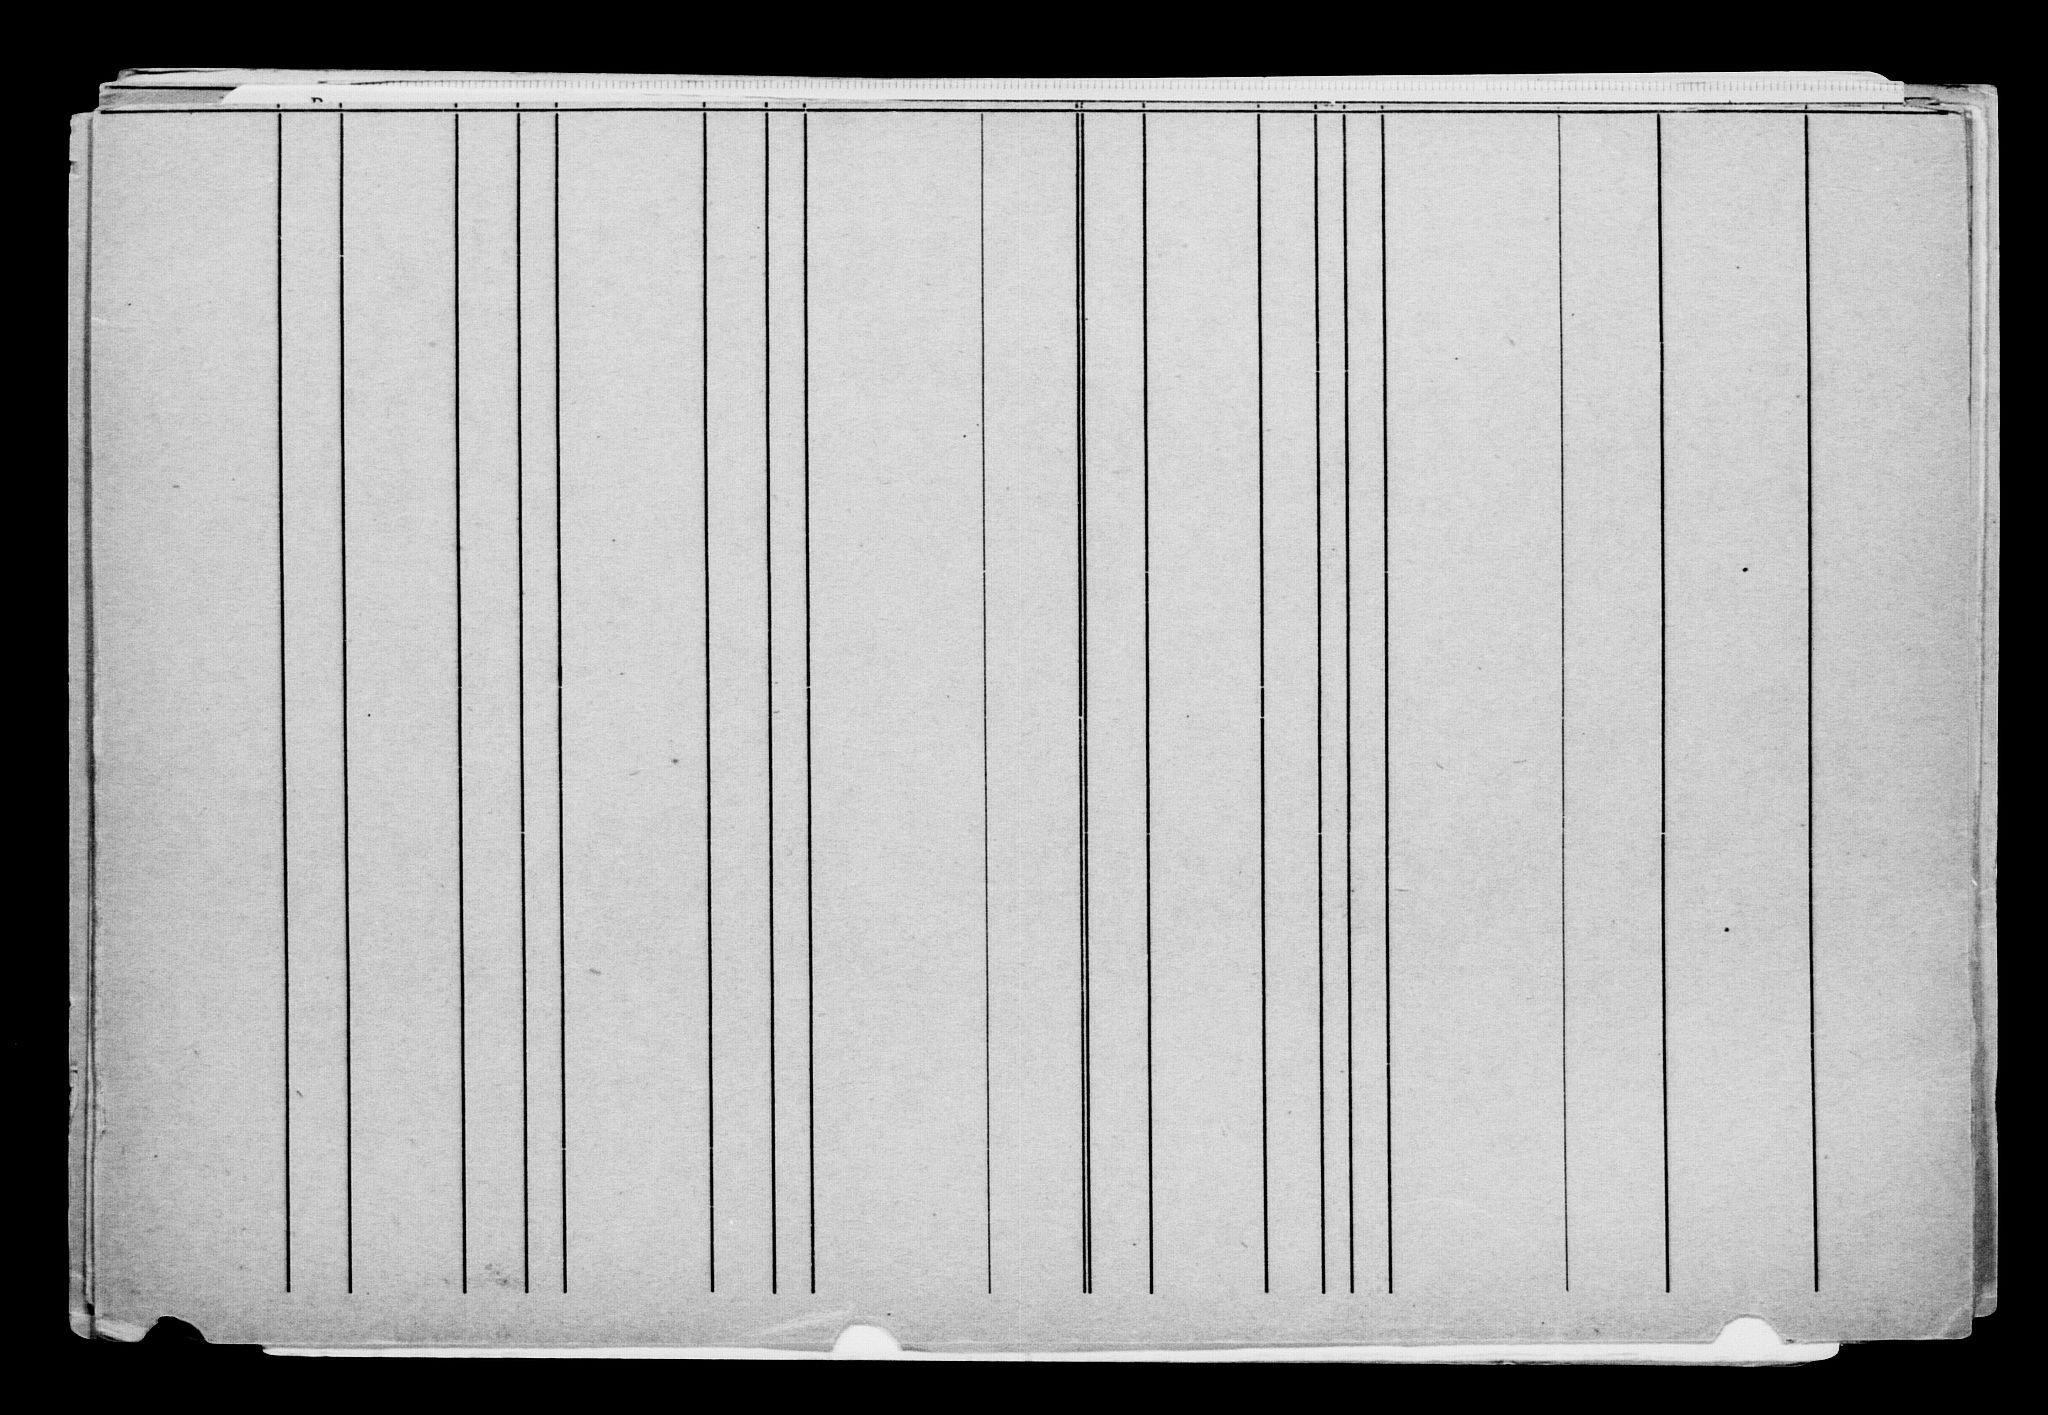 RA, Direktoratet for sjømenn, G/Gb/L0005: Hovedkort, 1888, s. 555